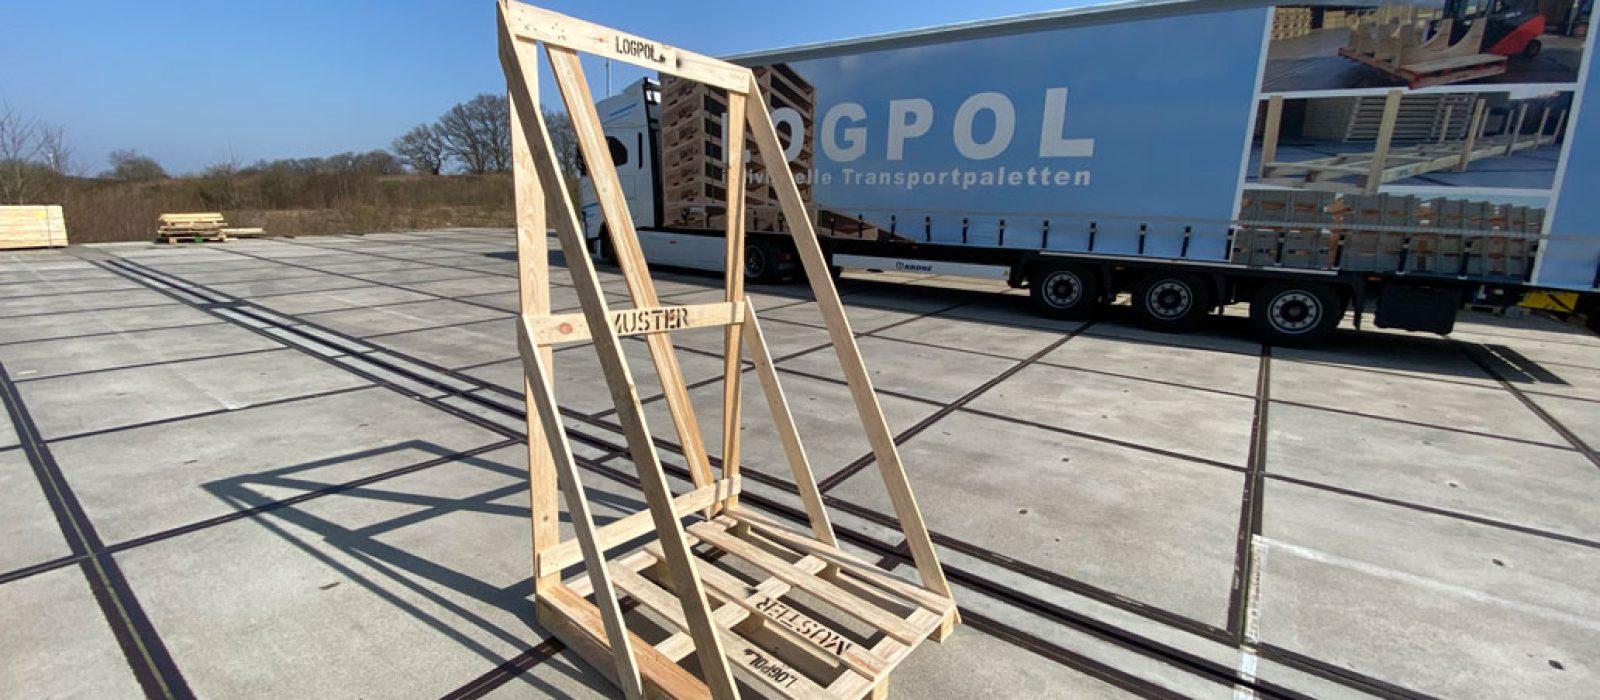 Gestell-1200x1000x2200-mm-LOGPOL